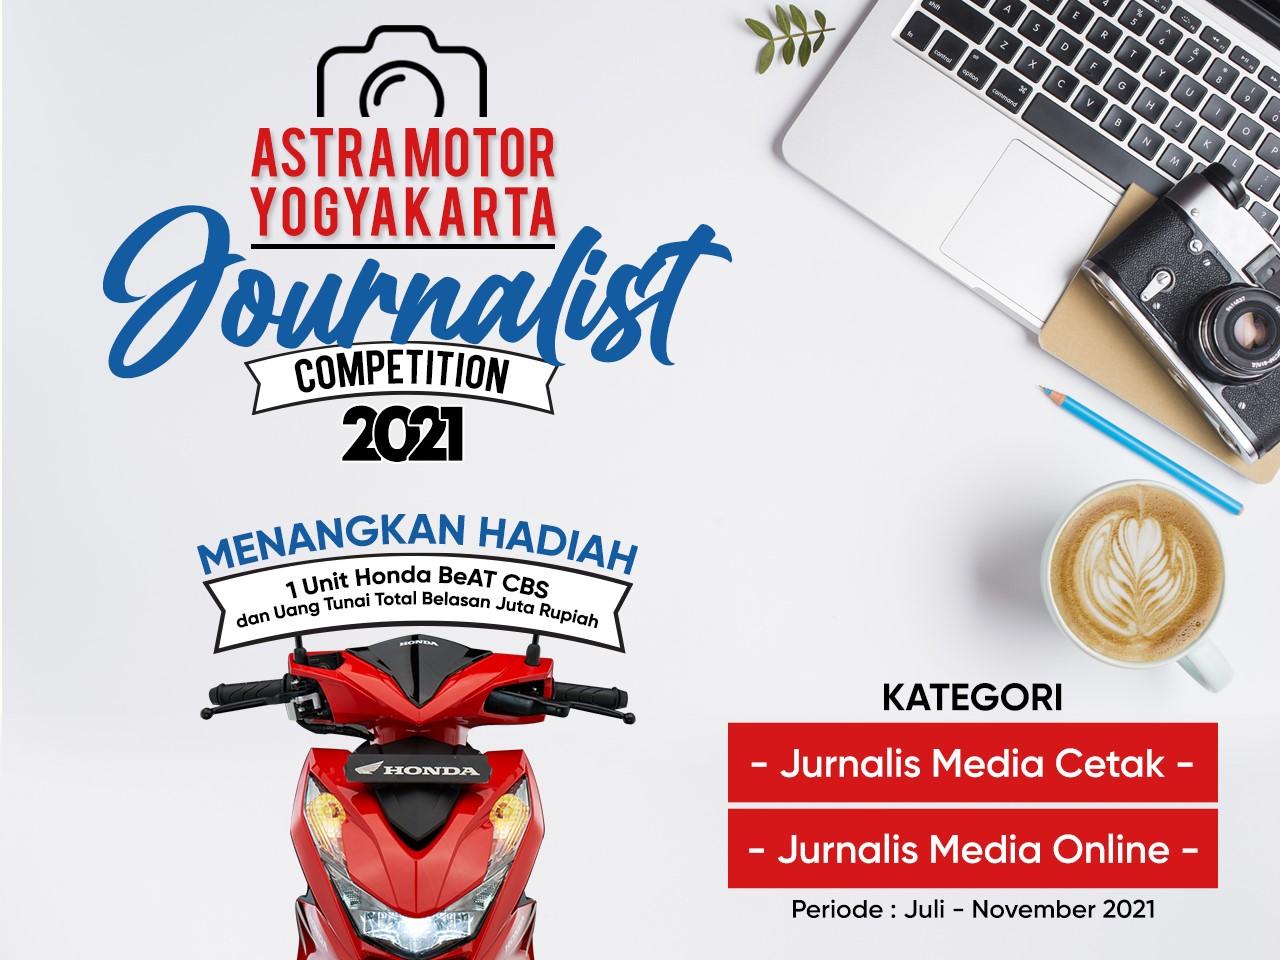 Kirim Karya Astra Motor Yogyakarta Journalist Competition 2021 (Media Online)